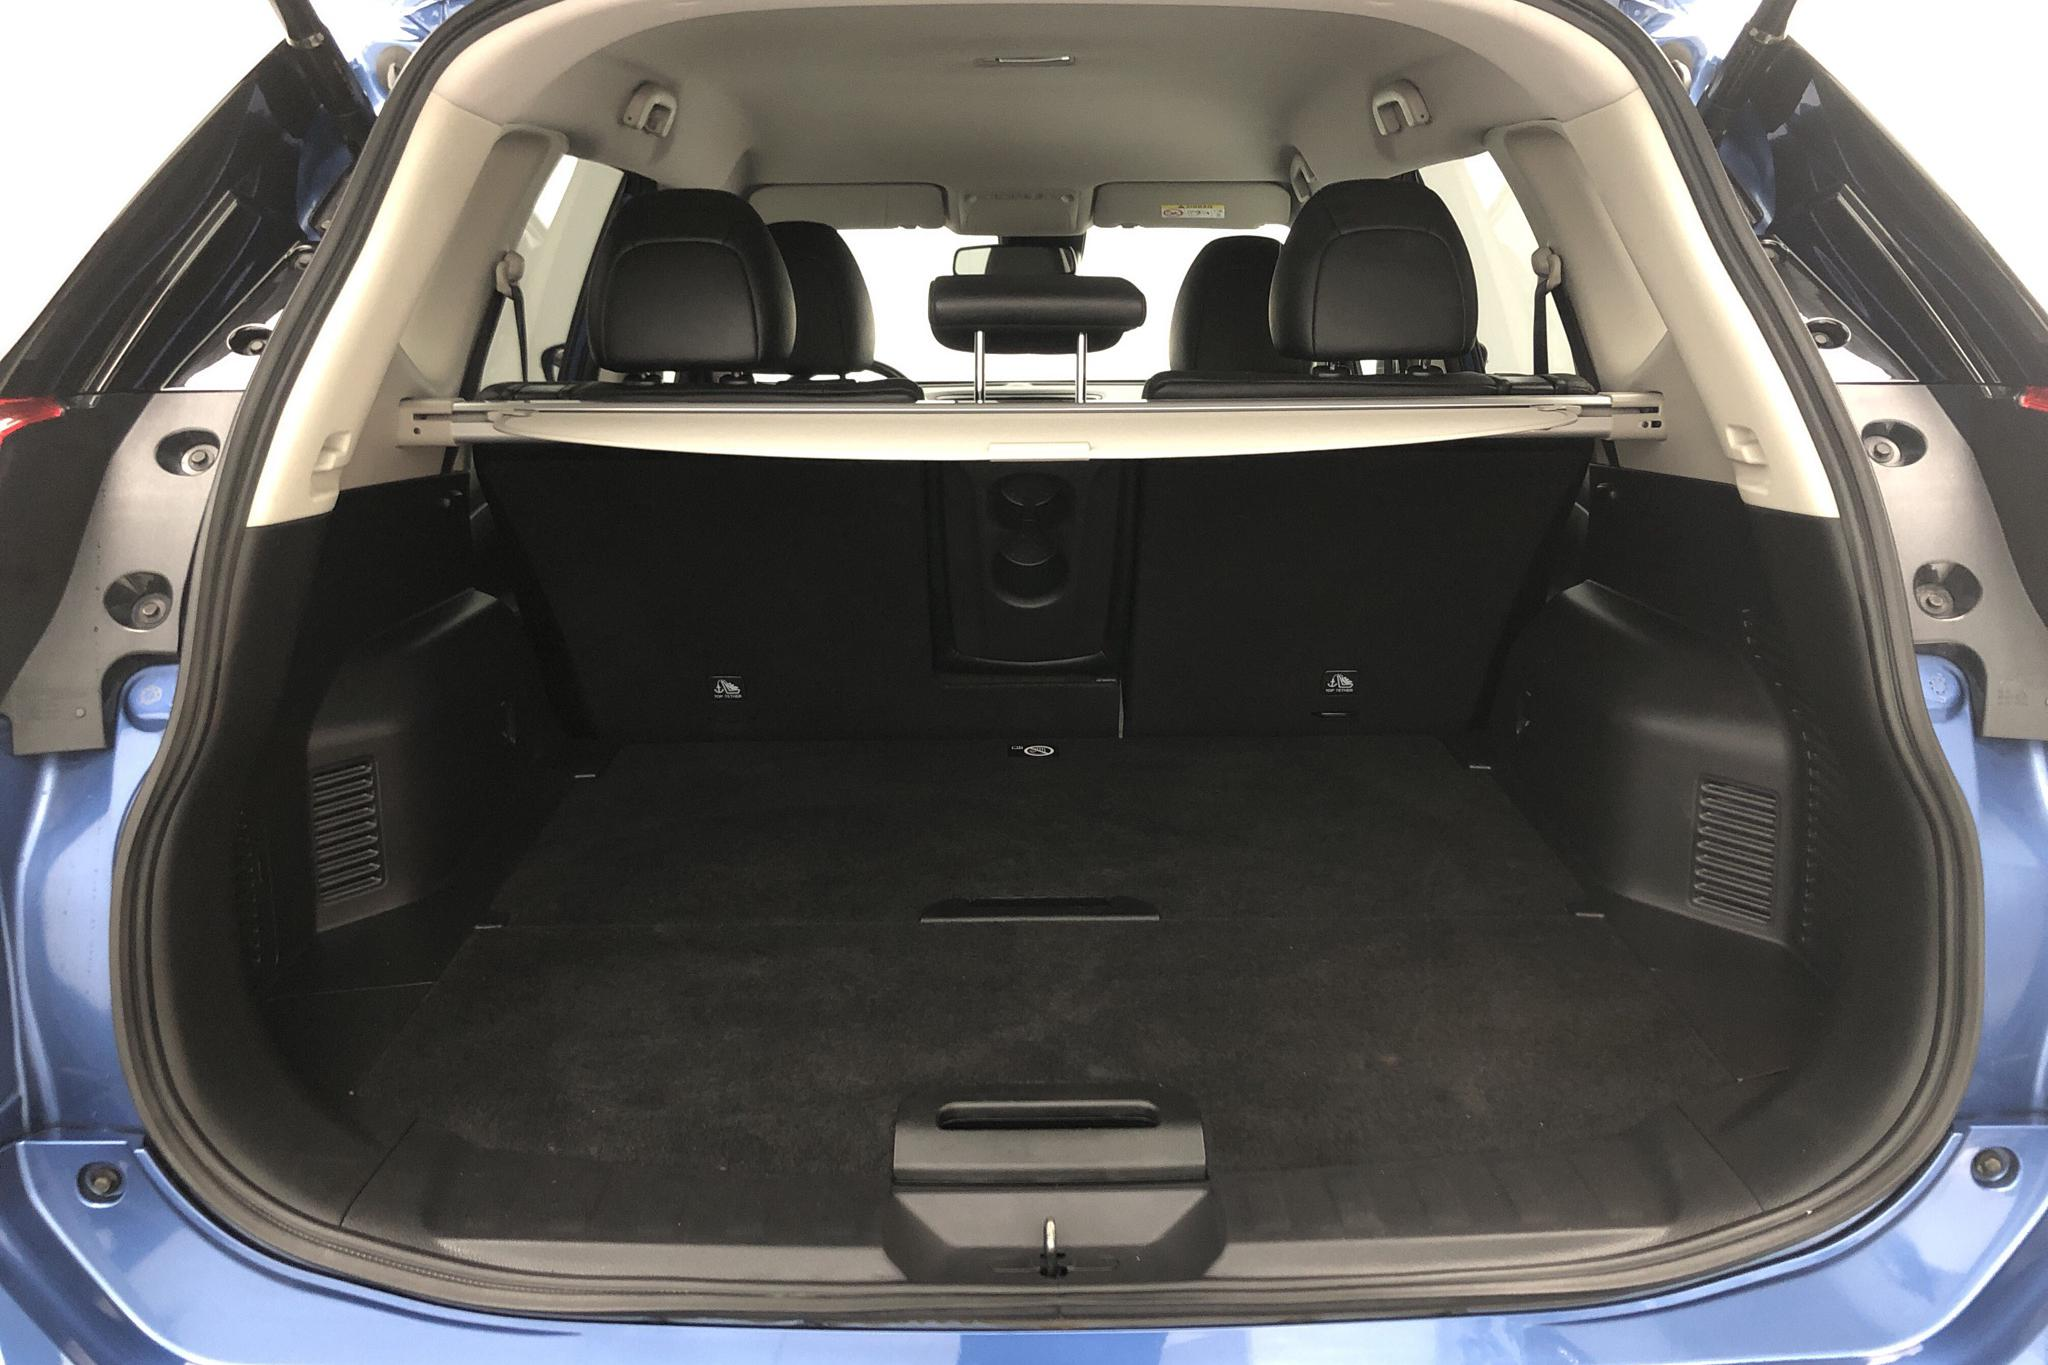 Nissan X-trail 1.6 dCi 2WD (130hk) - 5 237 mil - Automat - blå - 2017